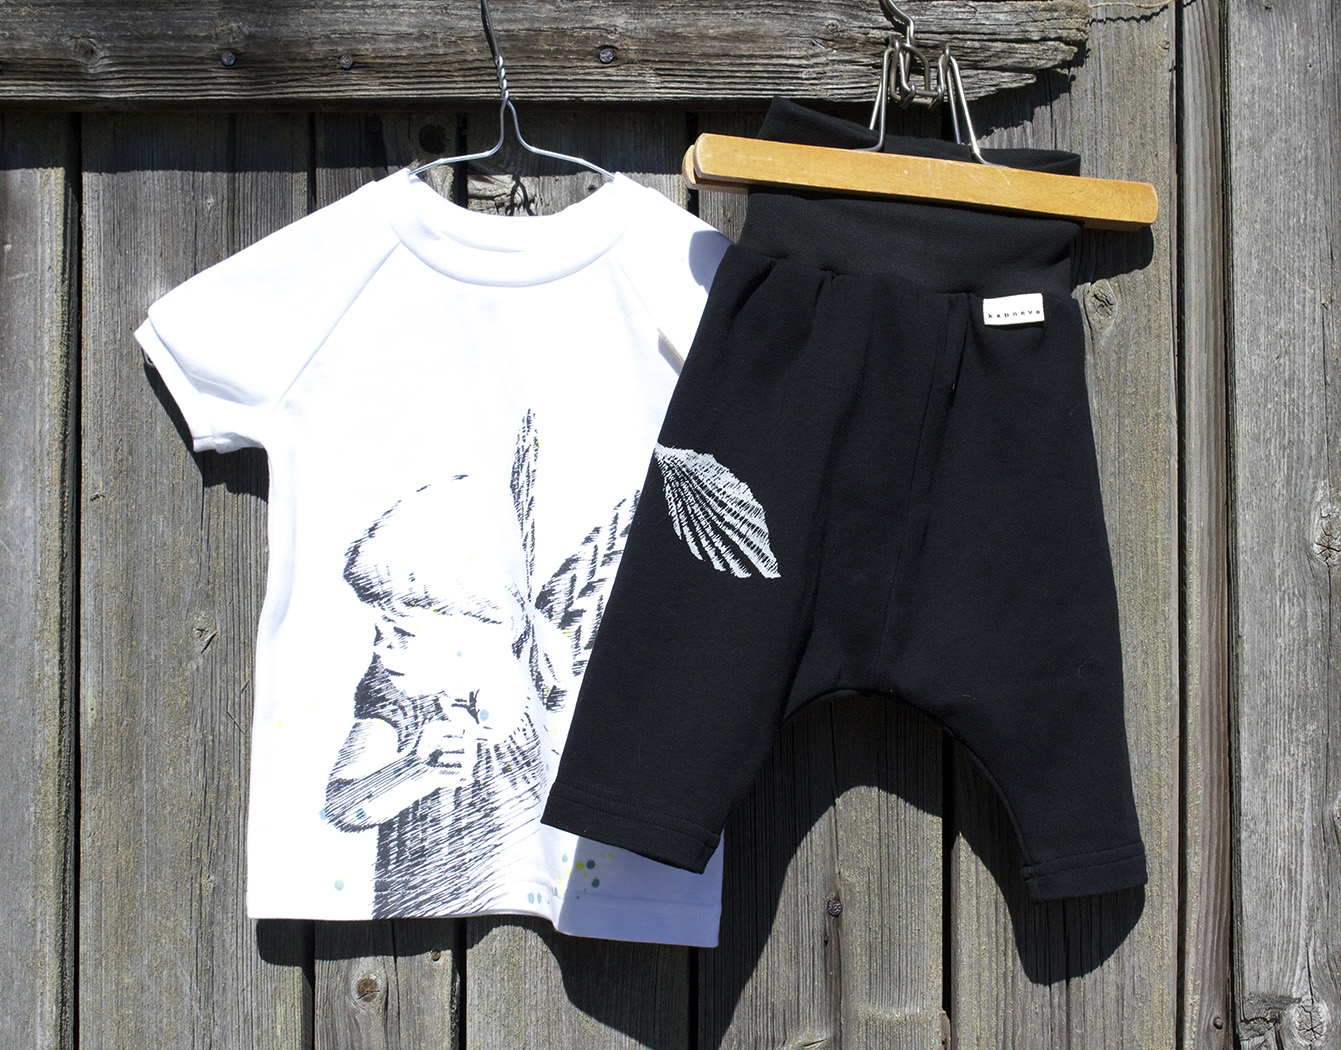 Illusioni T-shirt and Shorts